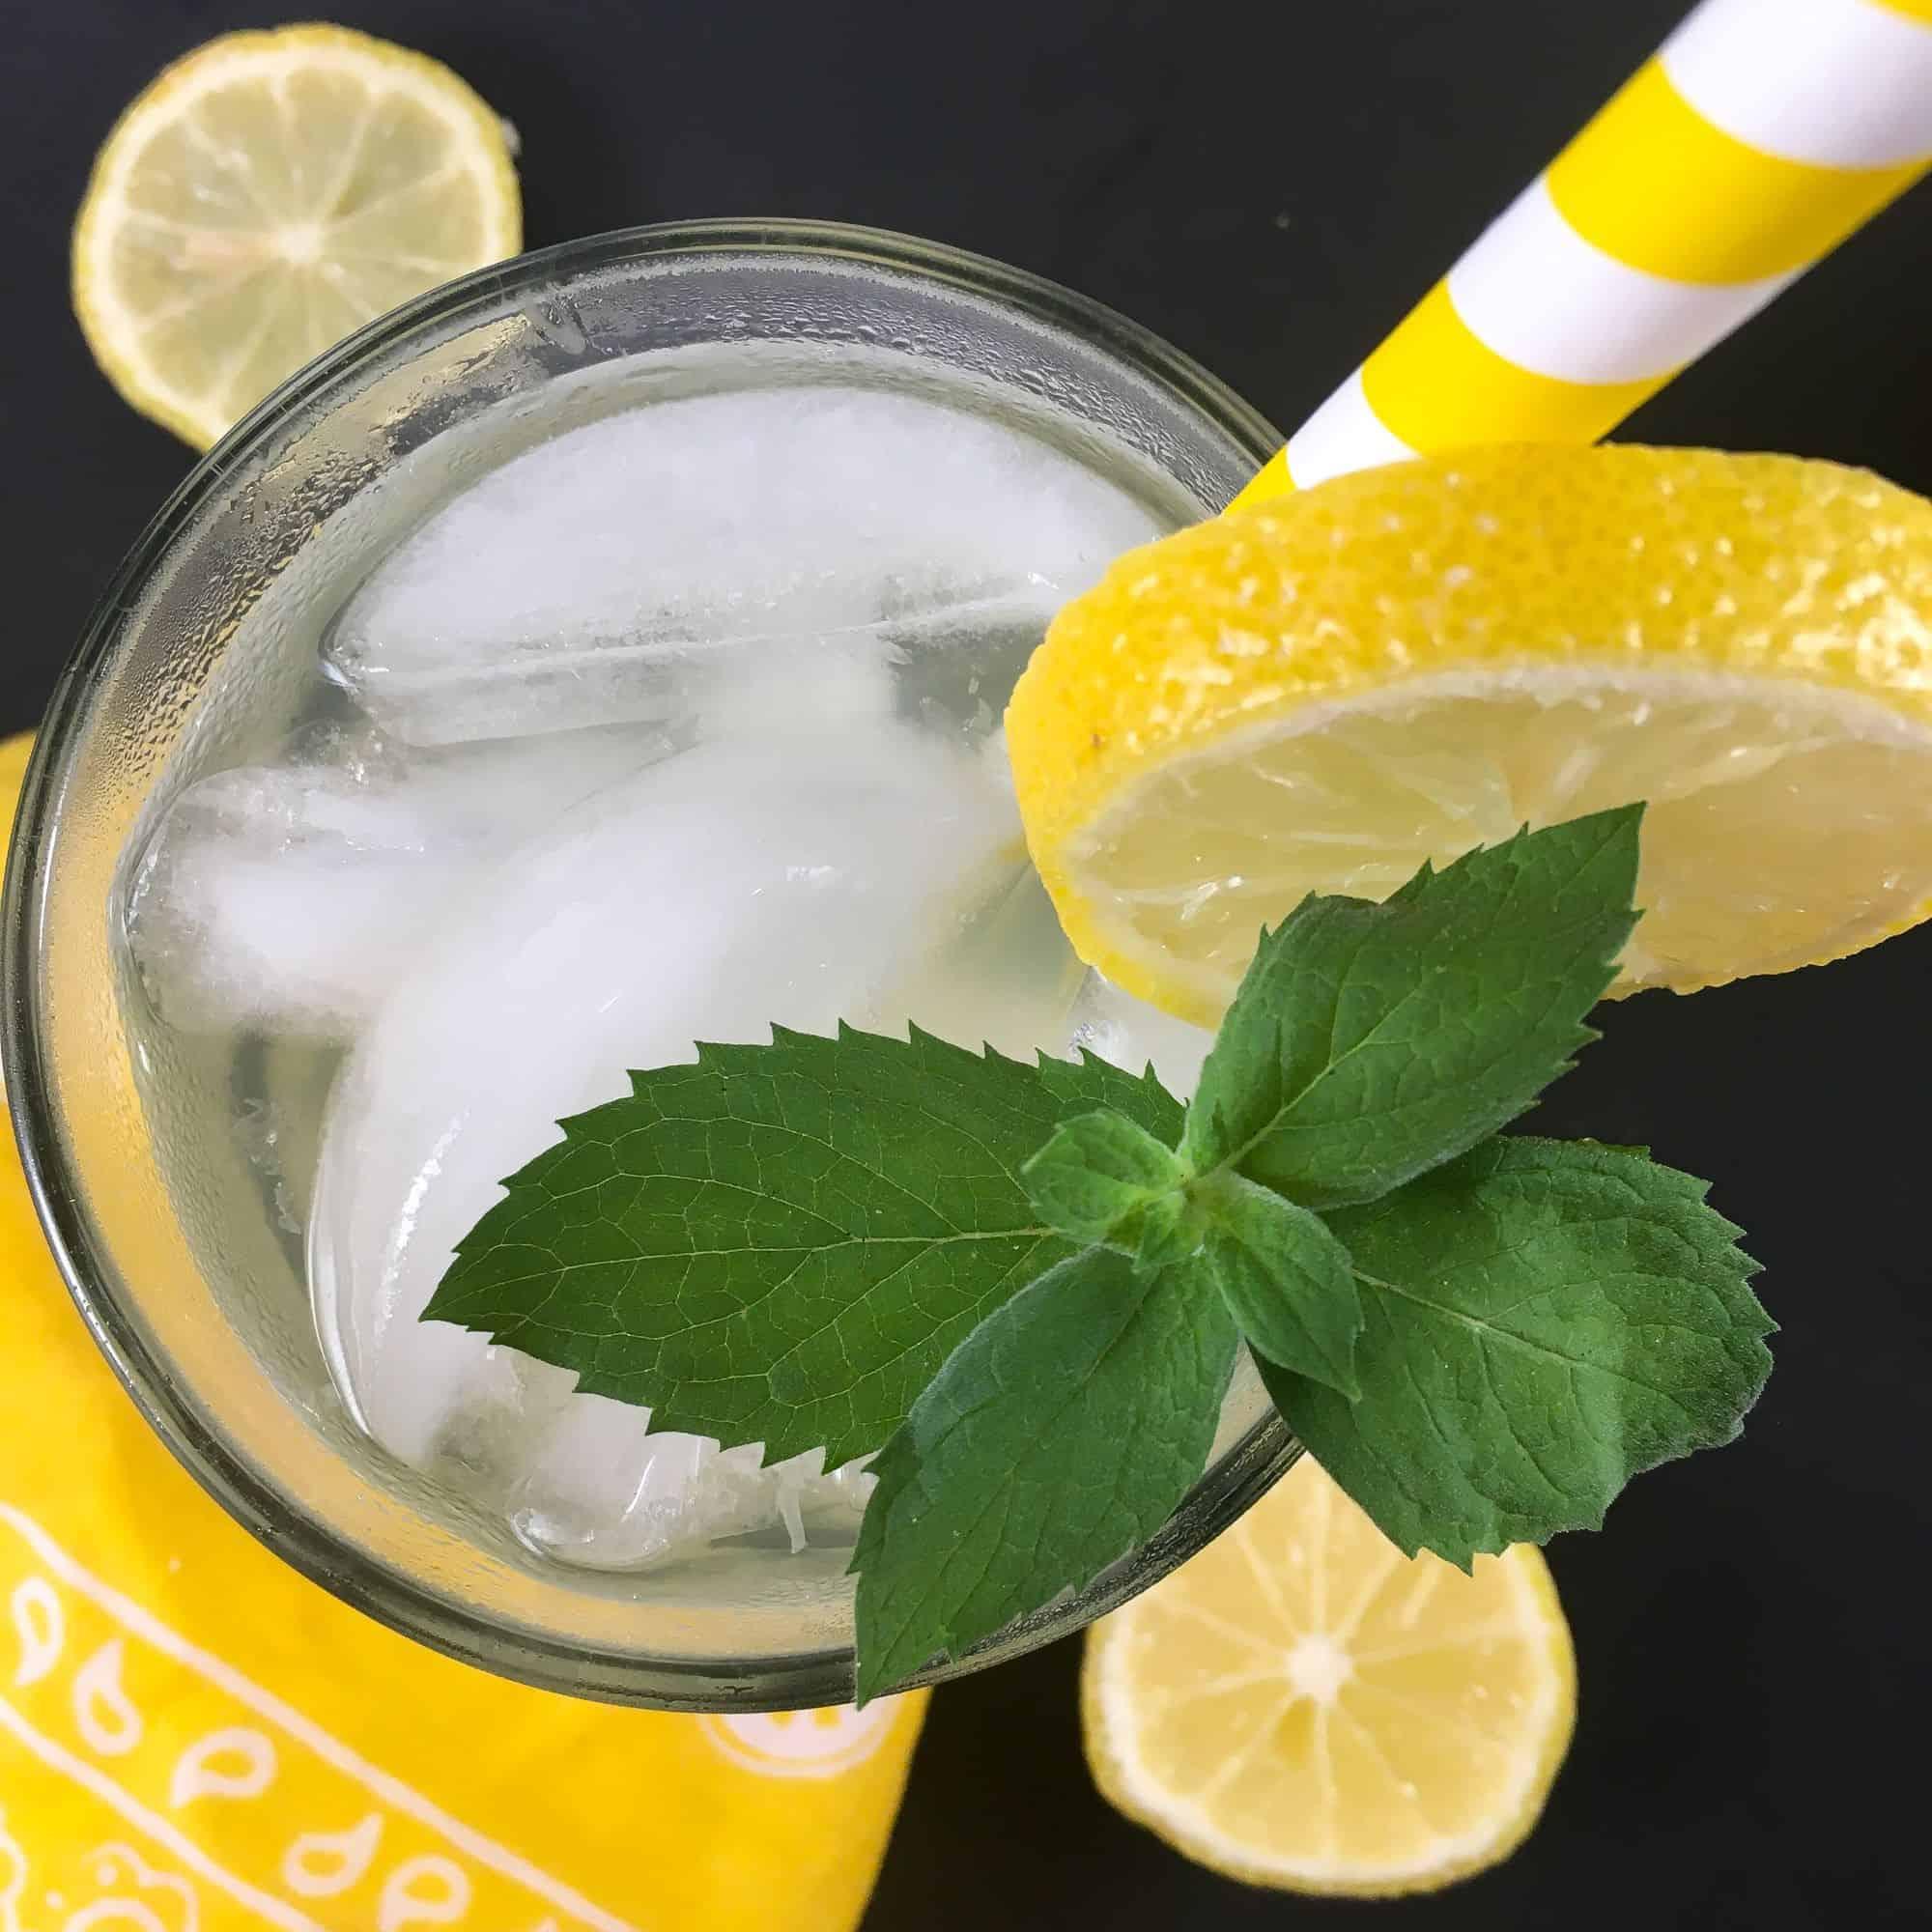 Keto lemonade over ice